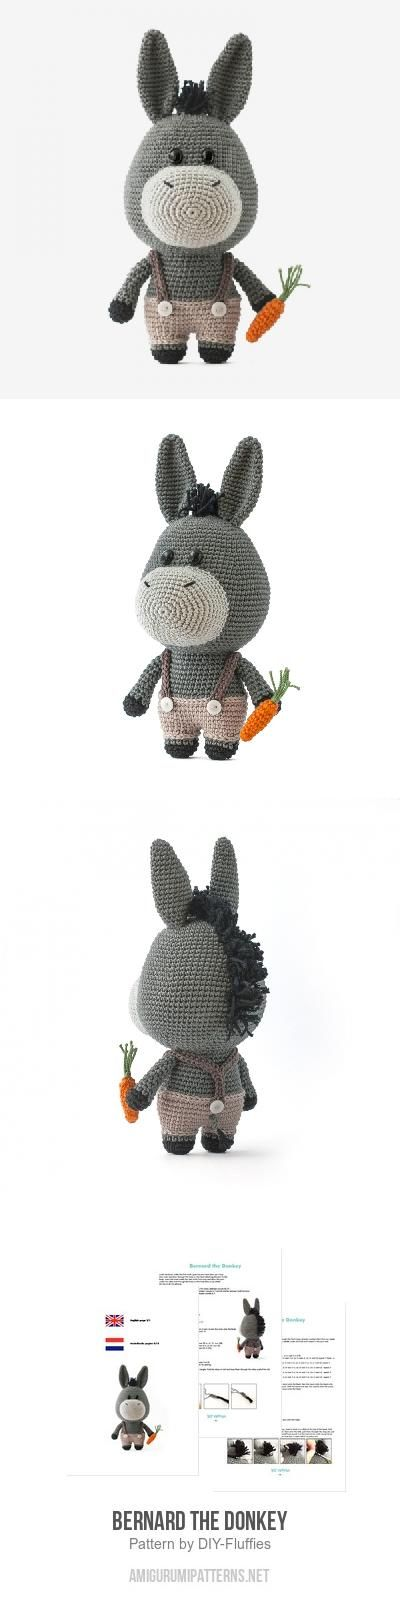 Bernard the Donkey amigurumi pattern   crochet toys   Pinterest ...